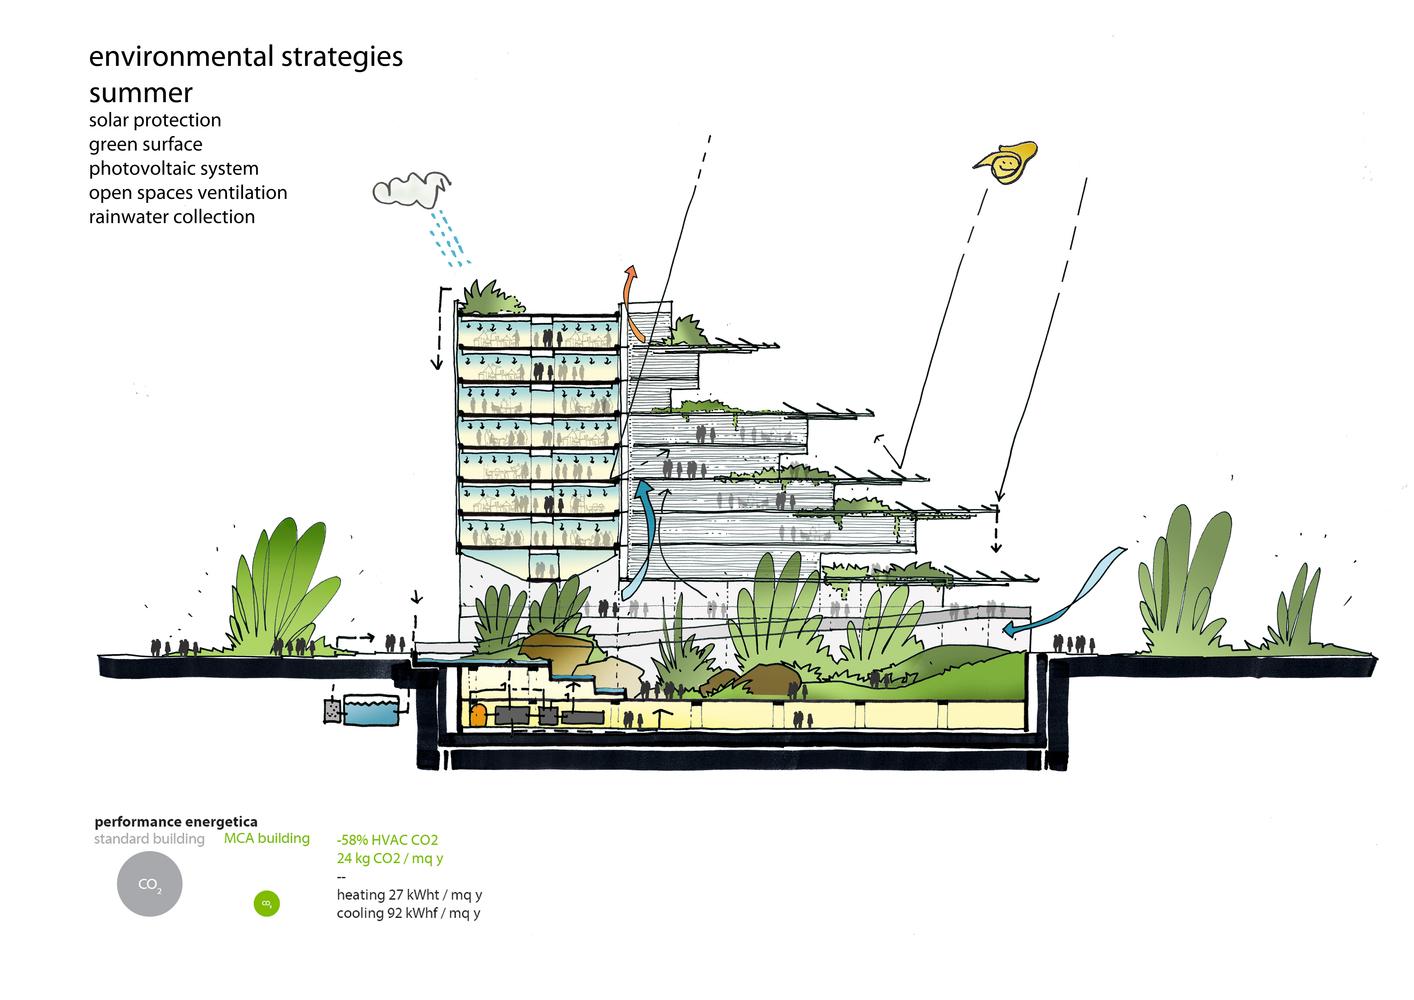 medium resolution of sino italian ecological and energy efficient building summer diagram